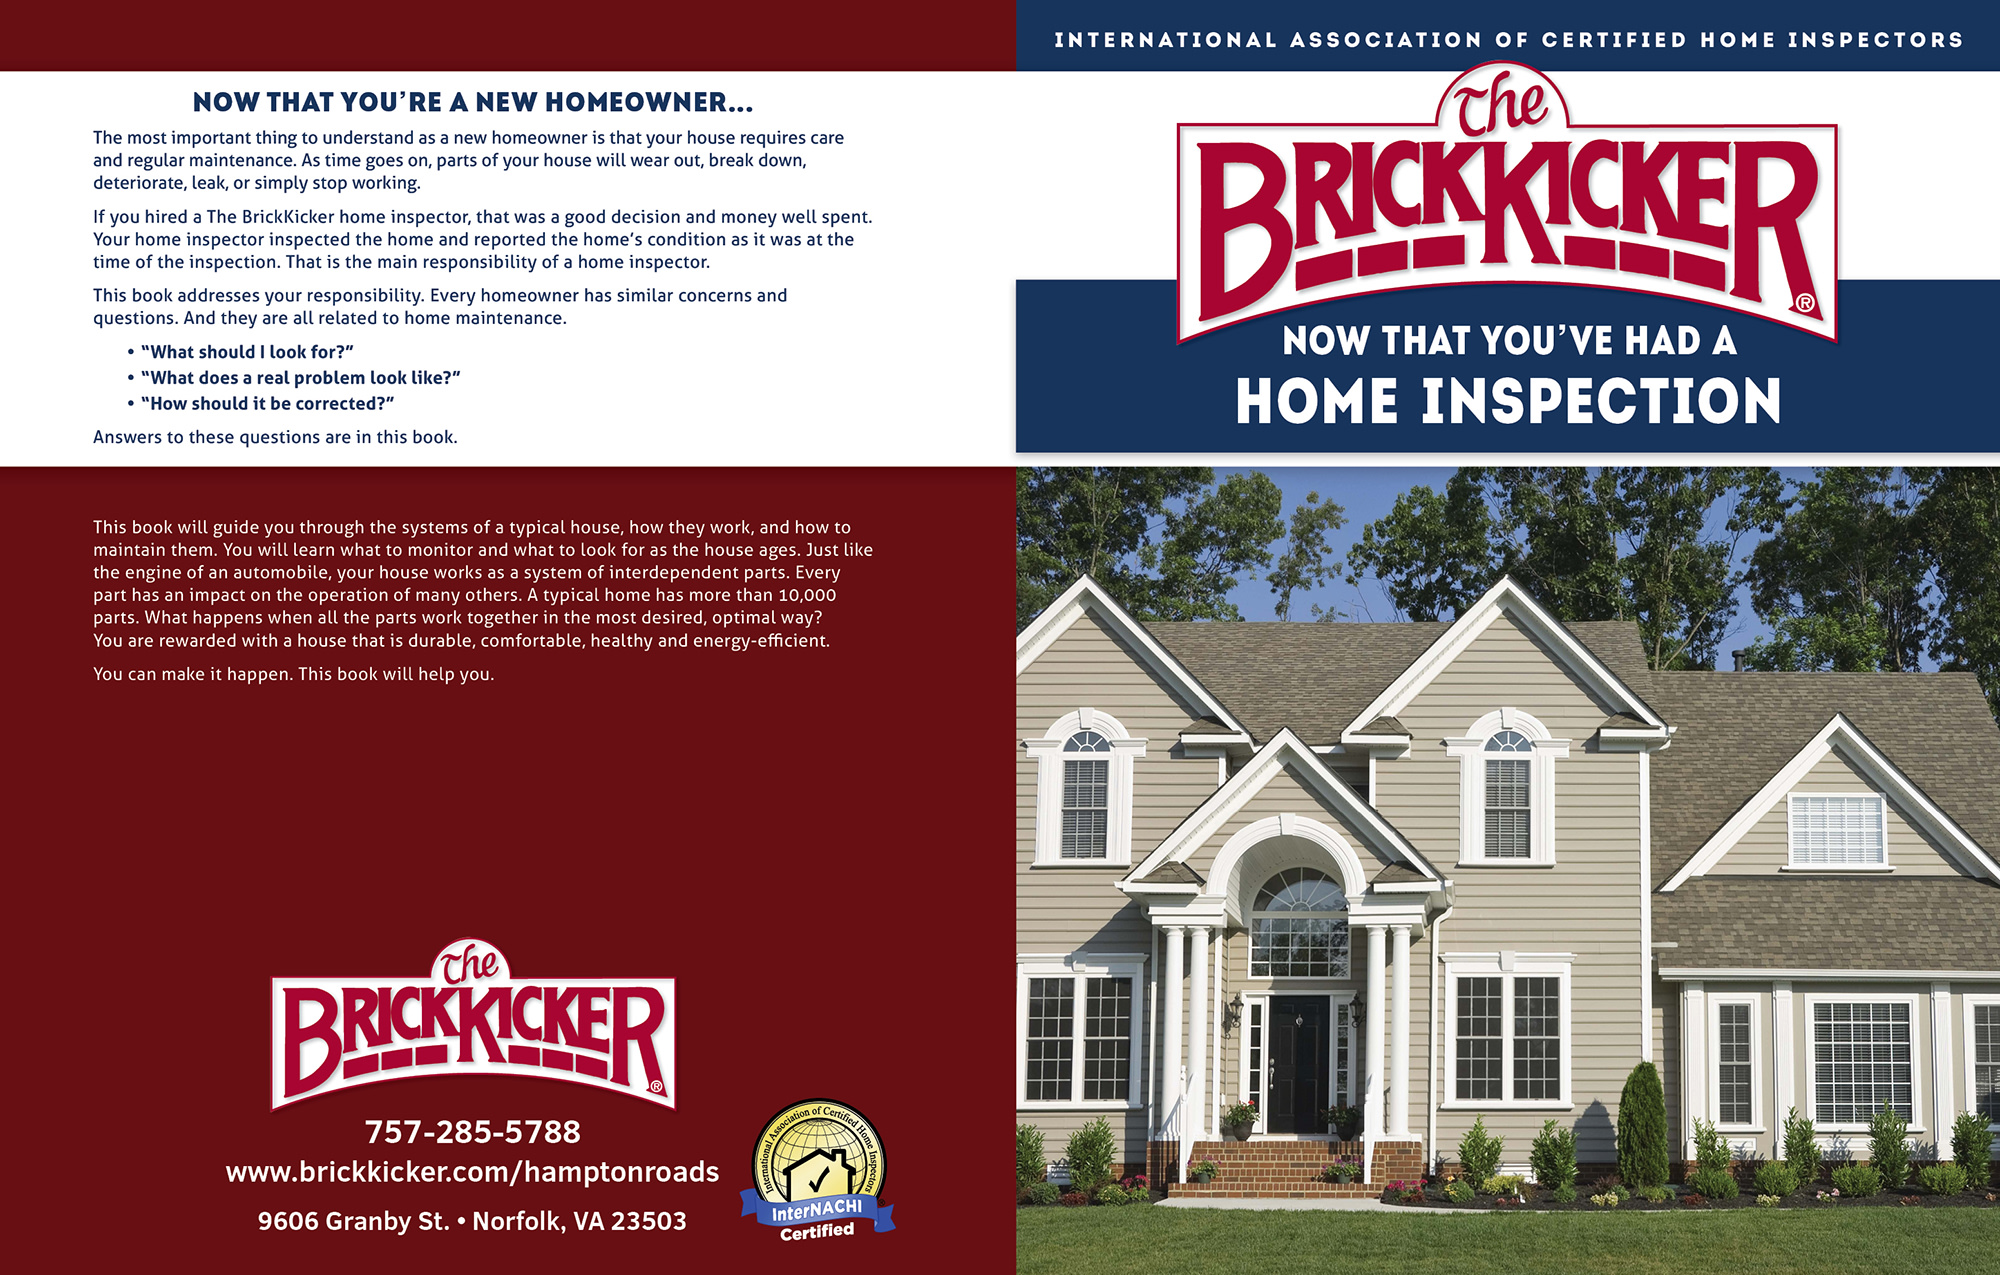 Custom Home Maintenance Book for BrickKicker.